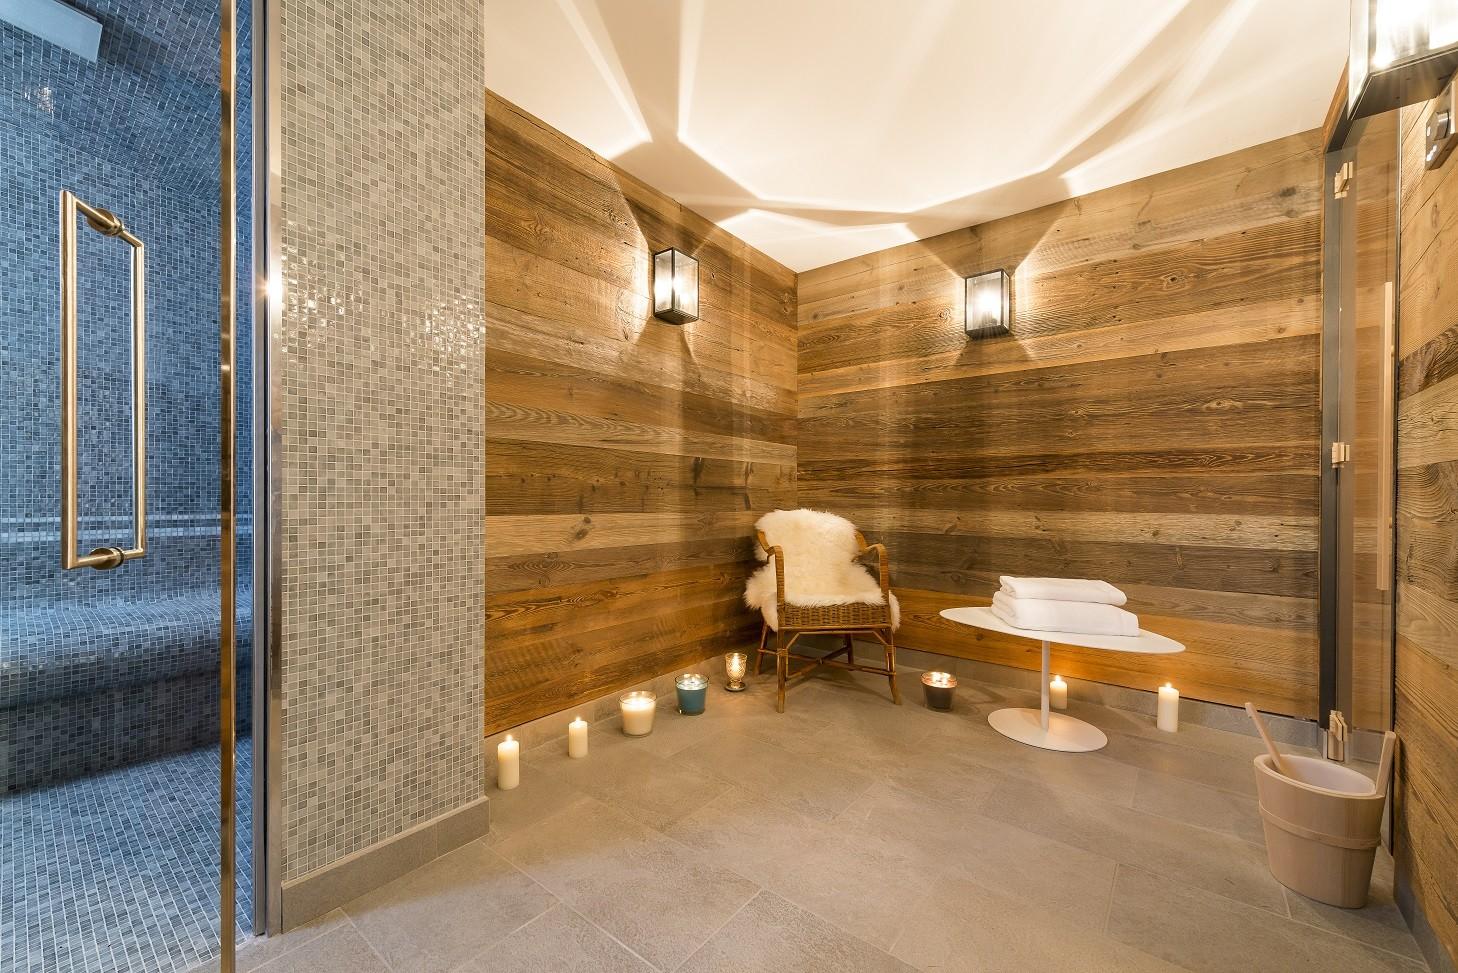 hammam-sauna-1-1458x973-7716